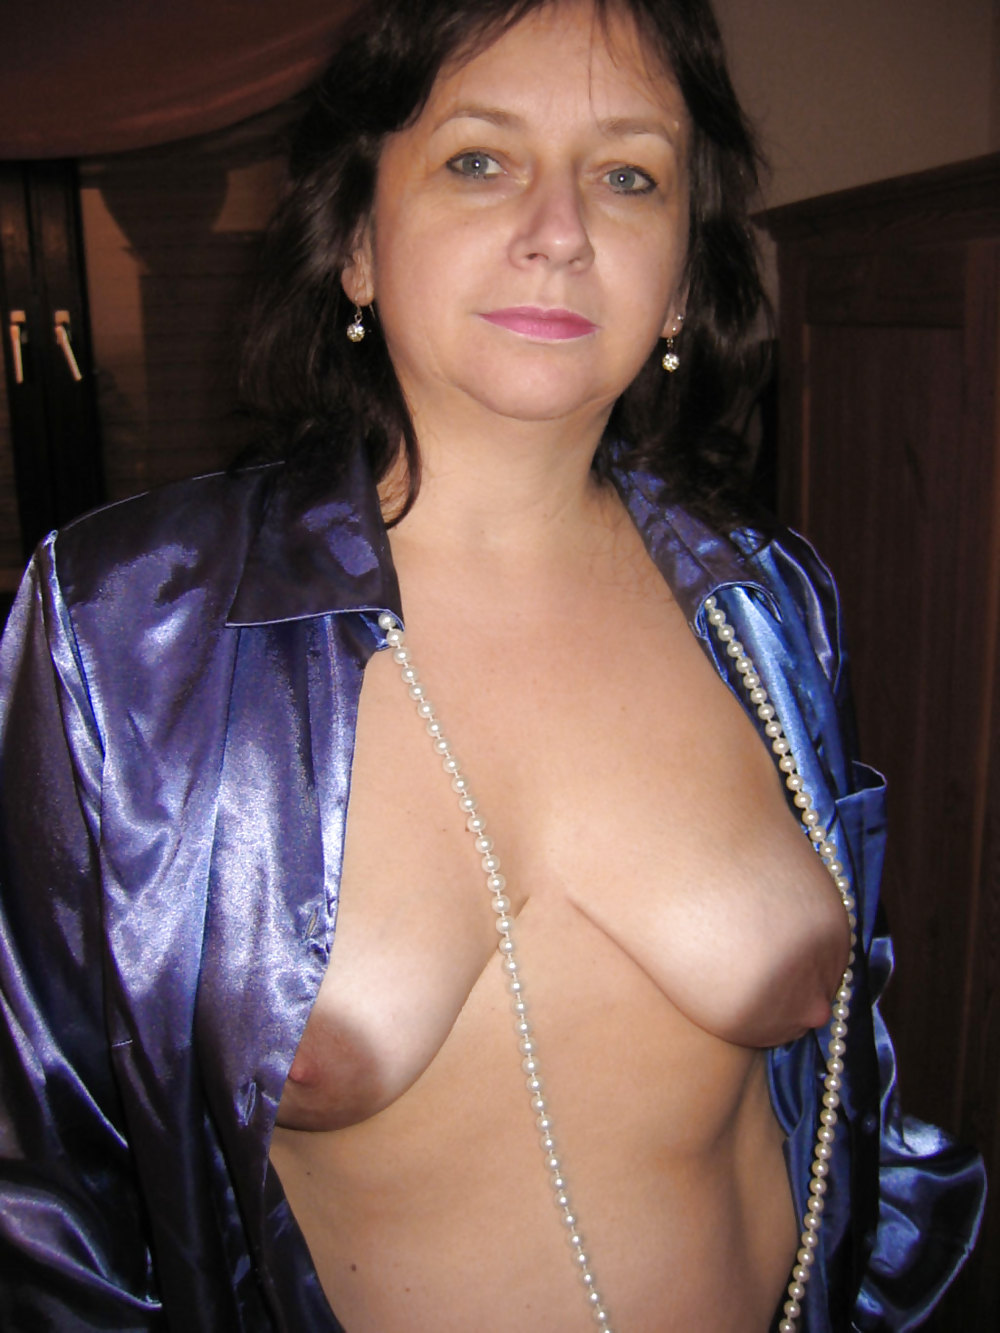 Naked Girls 18+ Bukkake abbey brooks